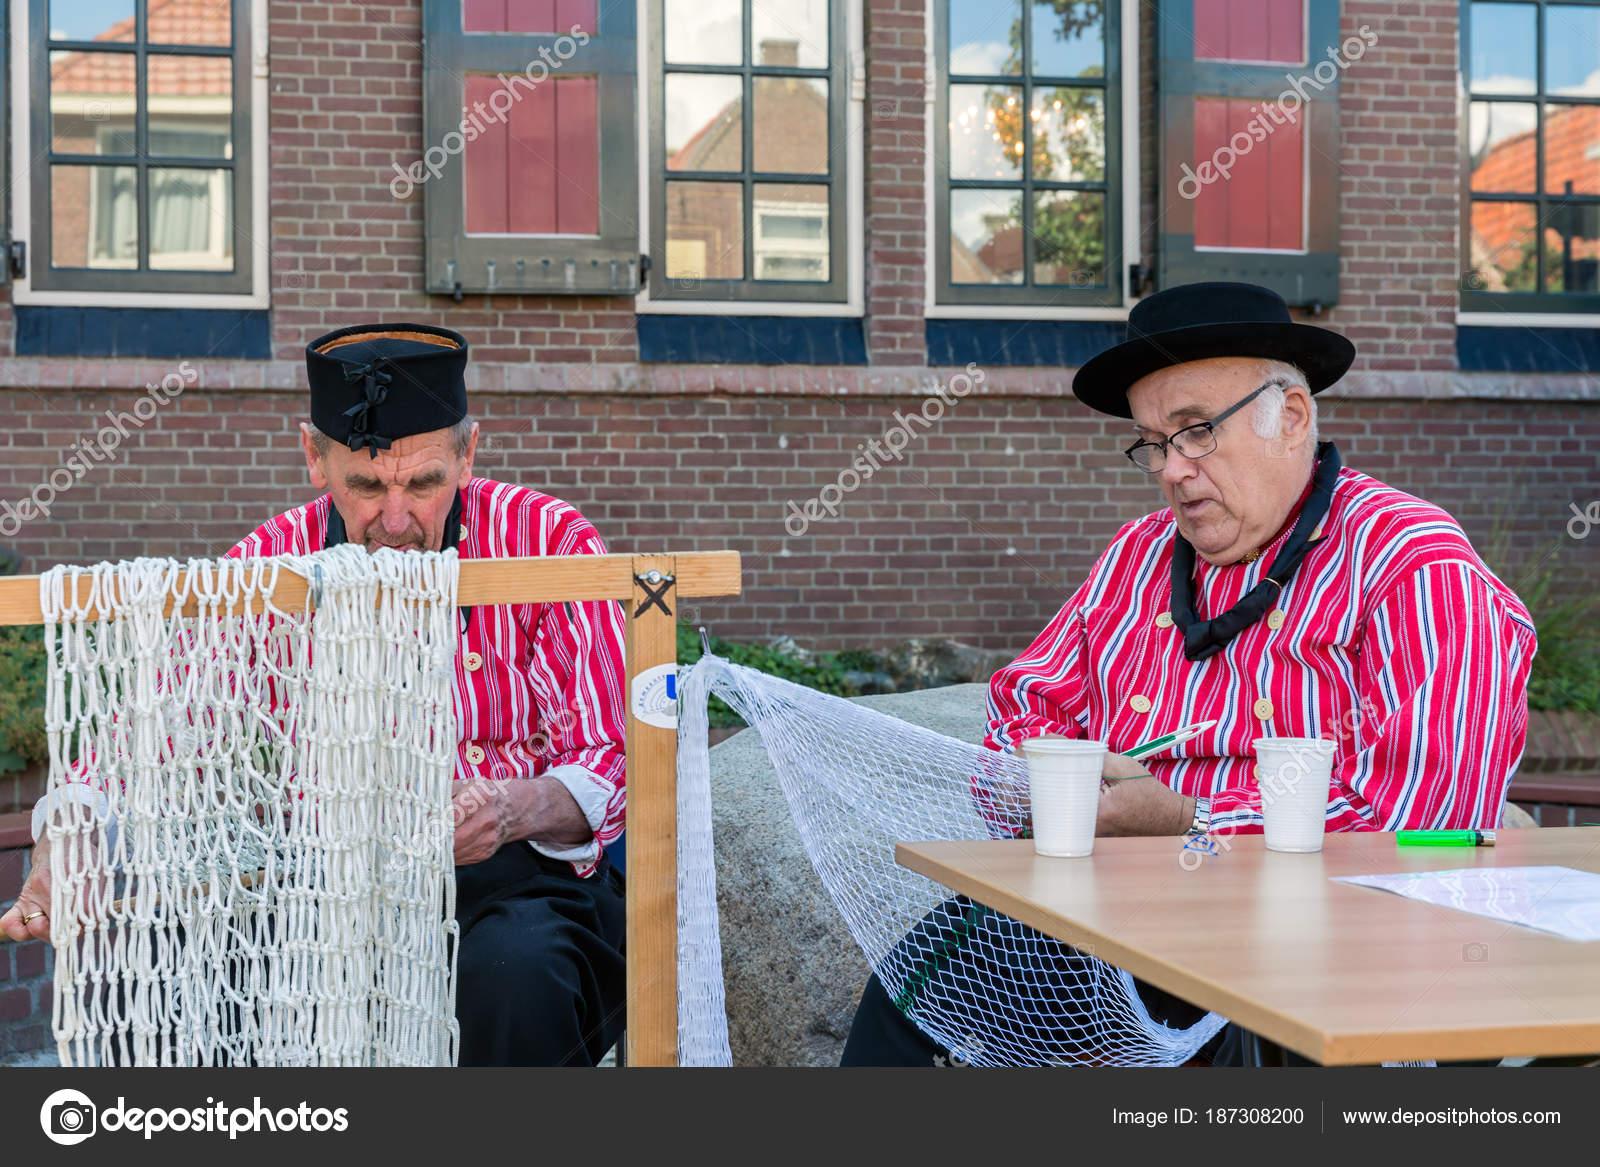 Nederlandse Kleding.Nederlandse Beurs Met Mannen In Traditionele Kleding Herstellen Van